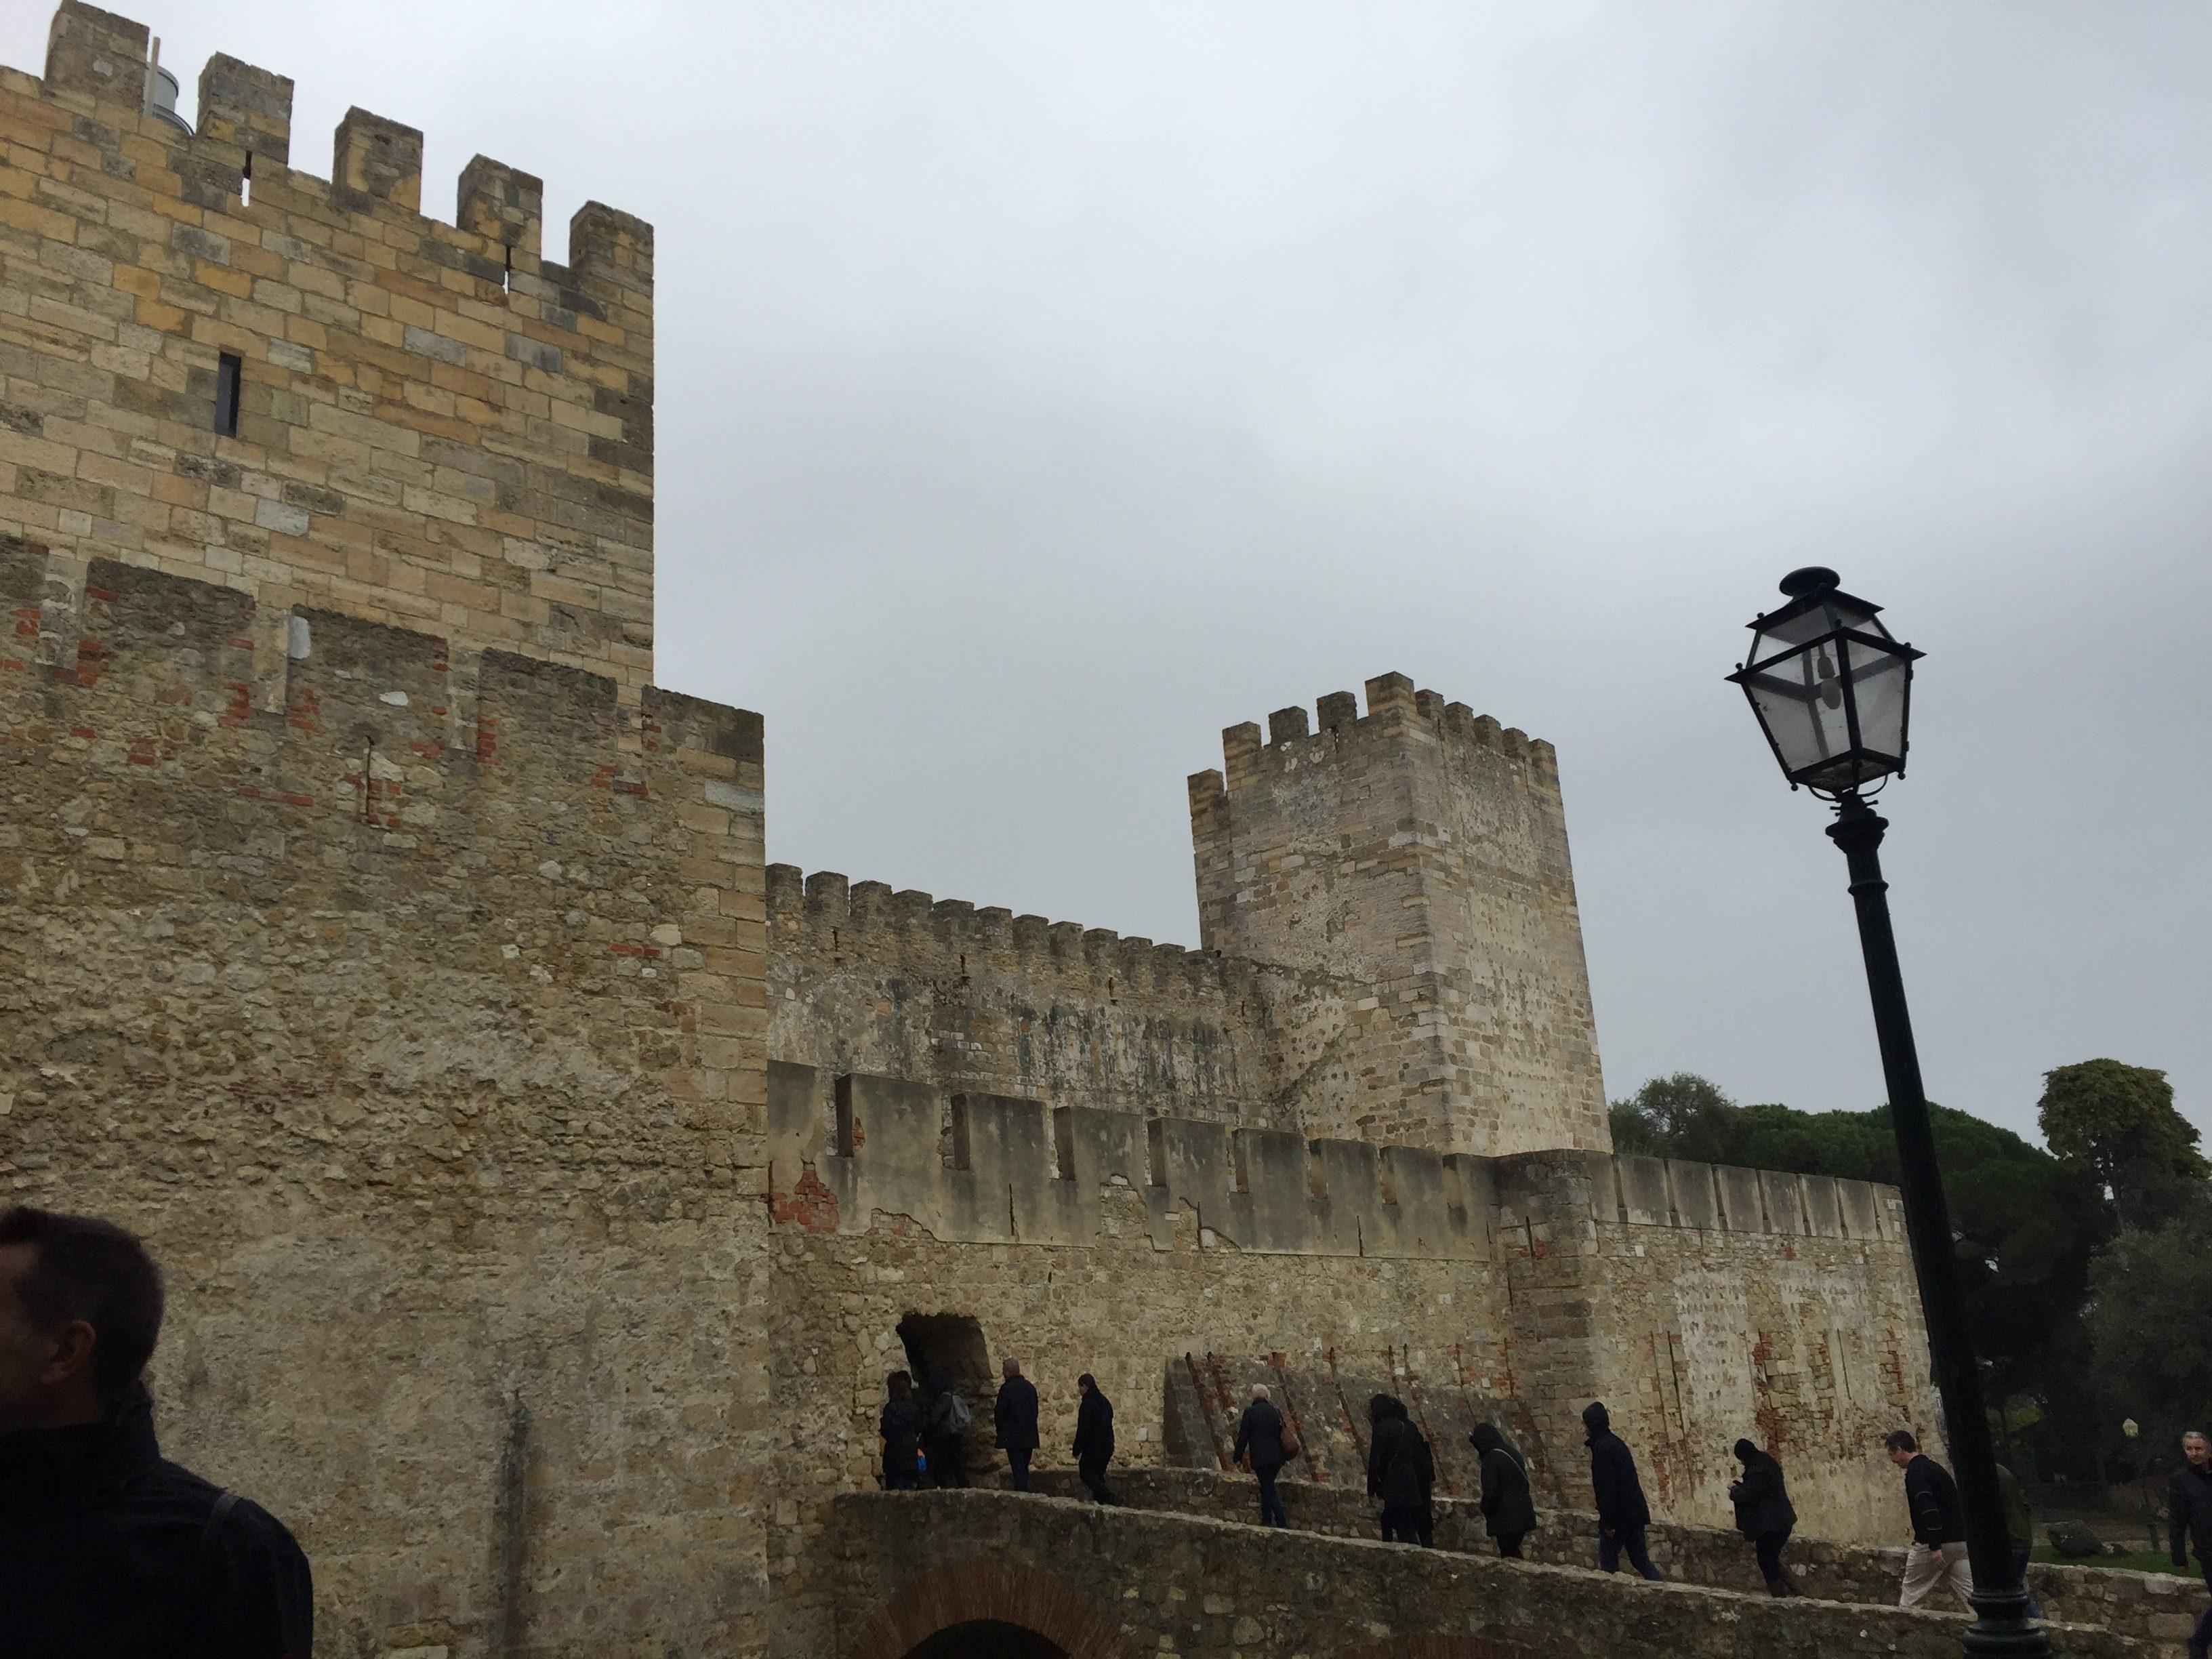 IMG 22751 e1515635356768 - Lugares para visitar en Lisboa (Parte II/II)